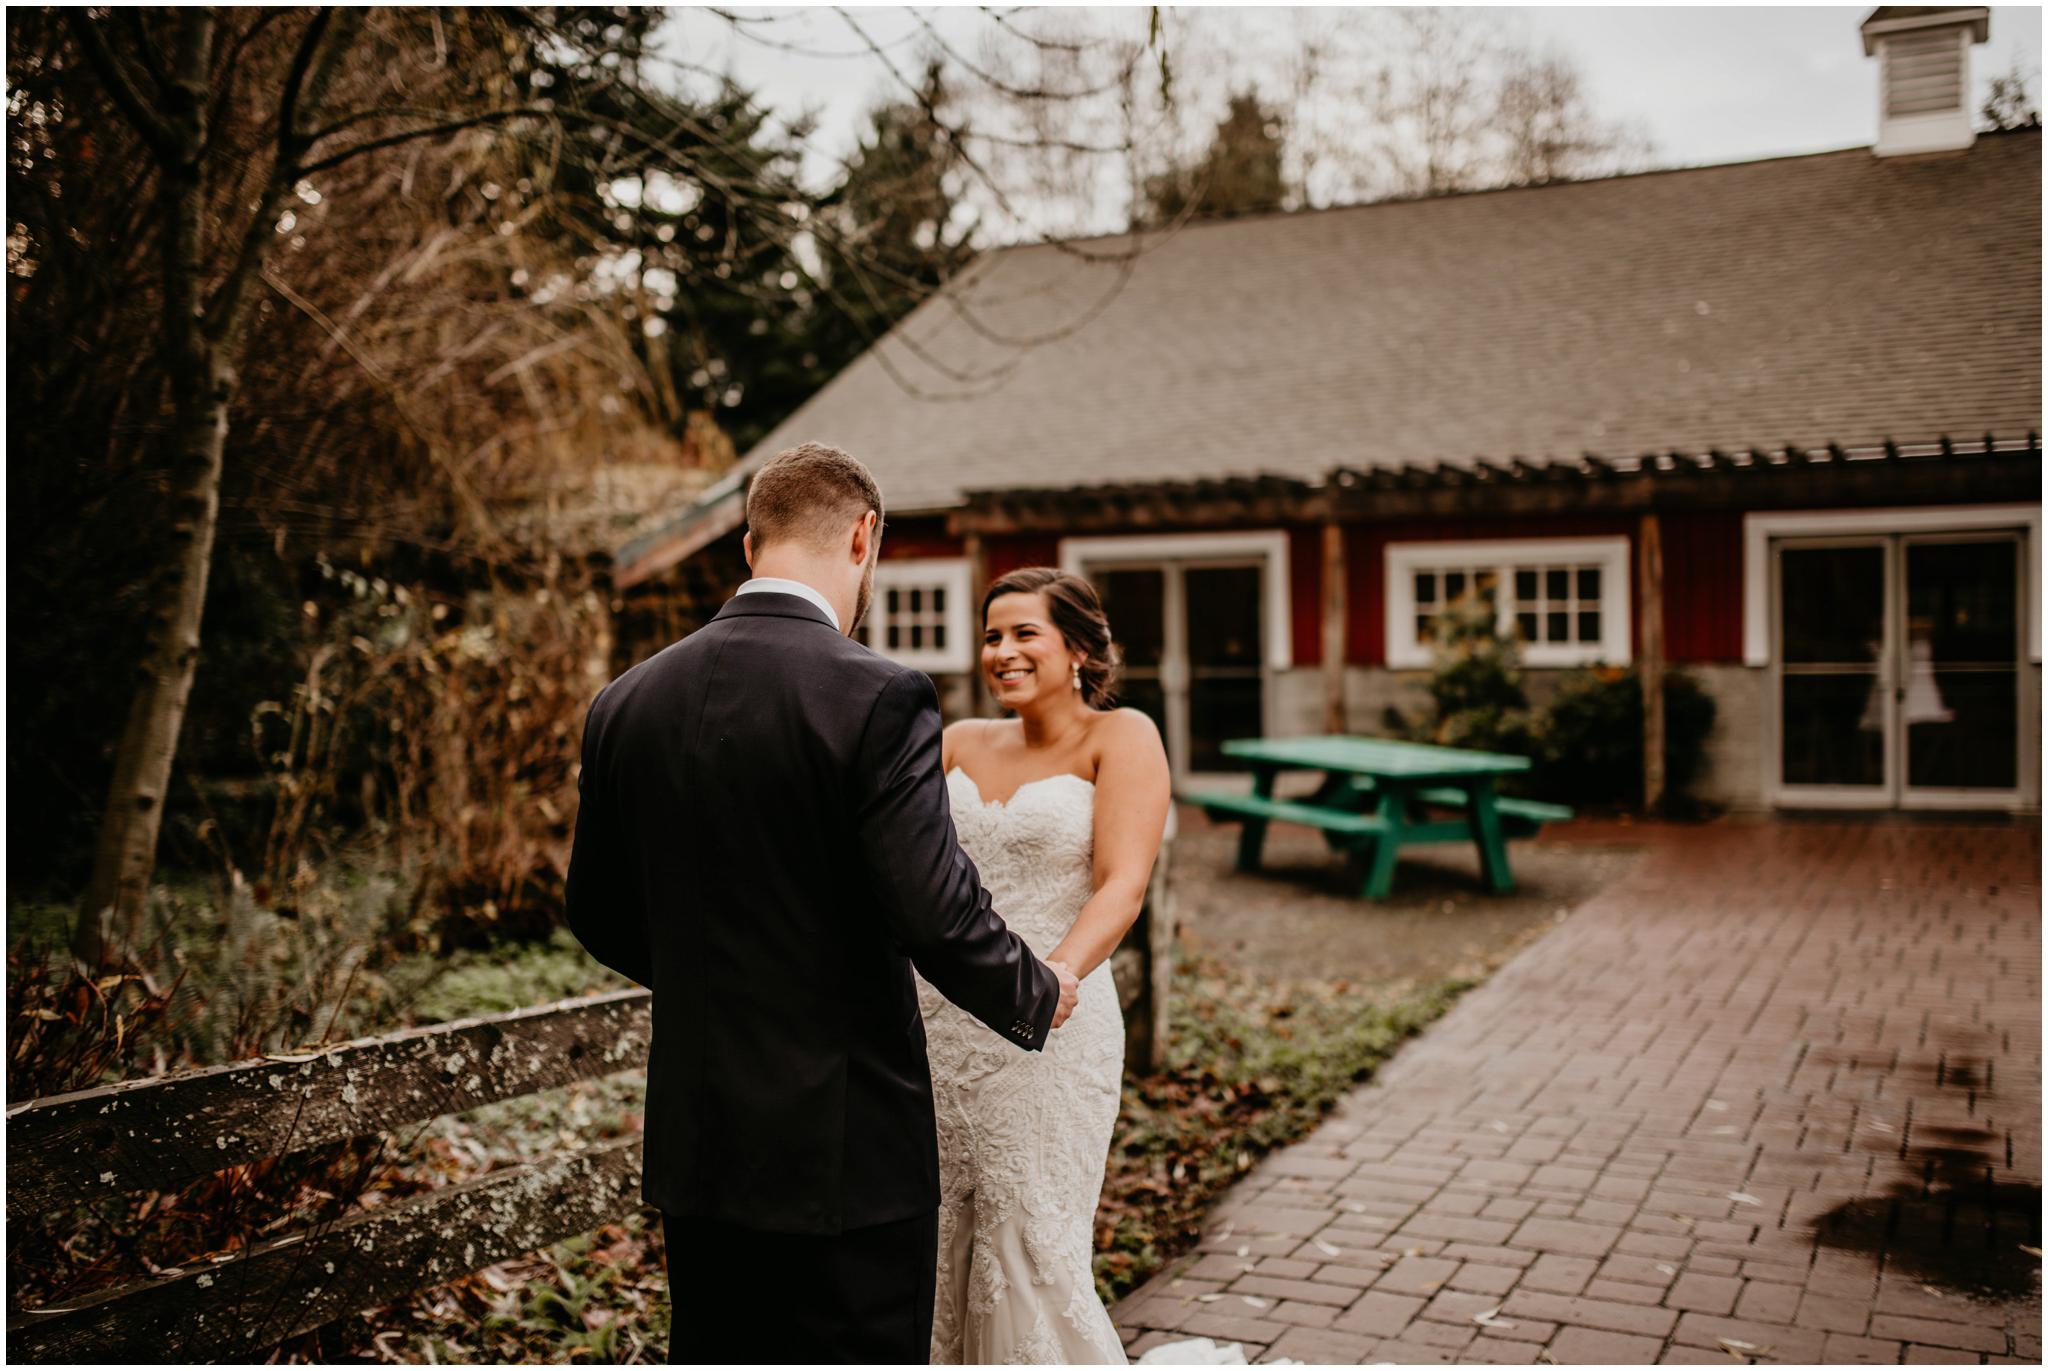 ashley-tj-the-pickering-barn-winter-wedding-seattle-photographer-021.jpg